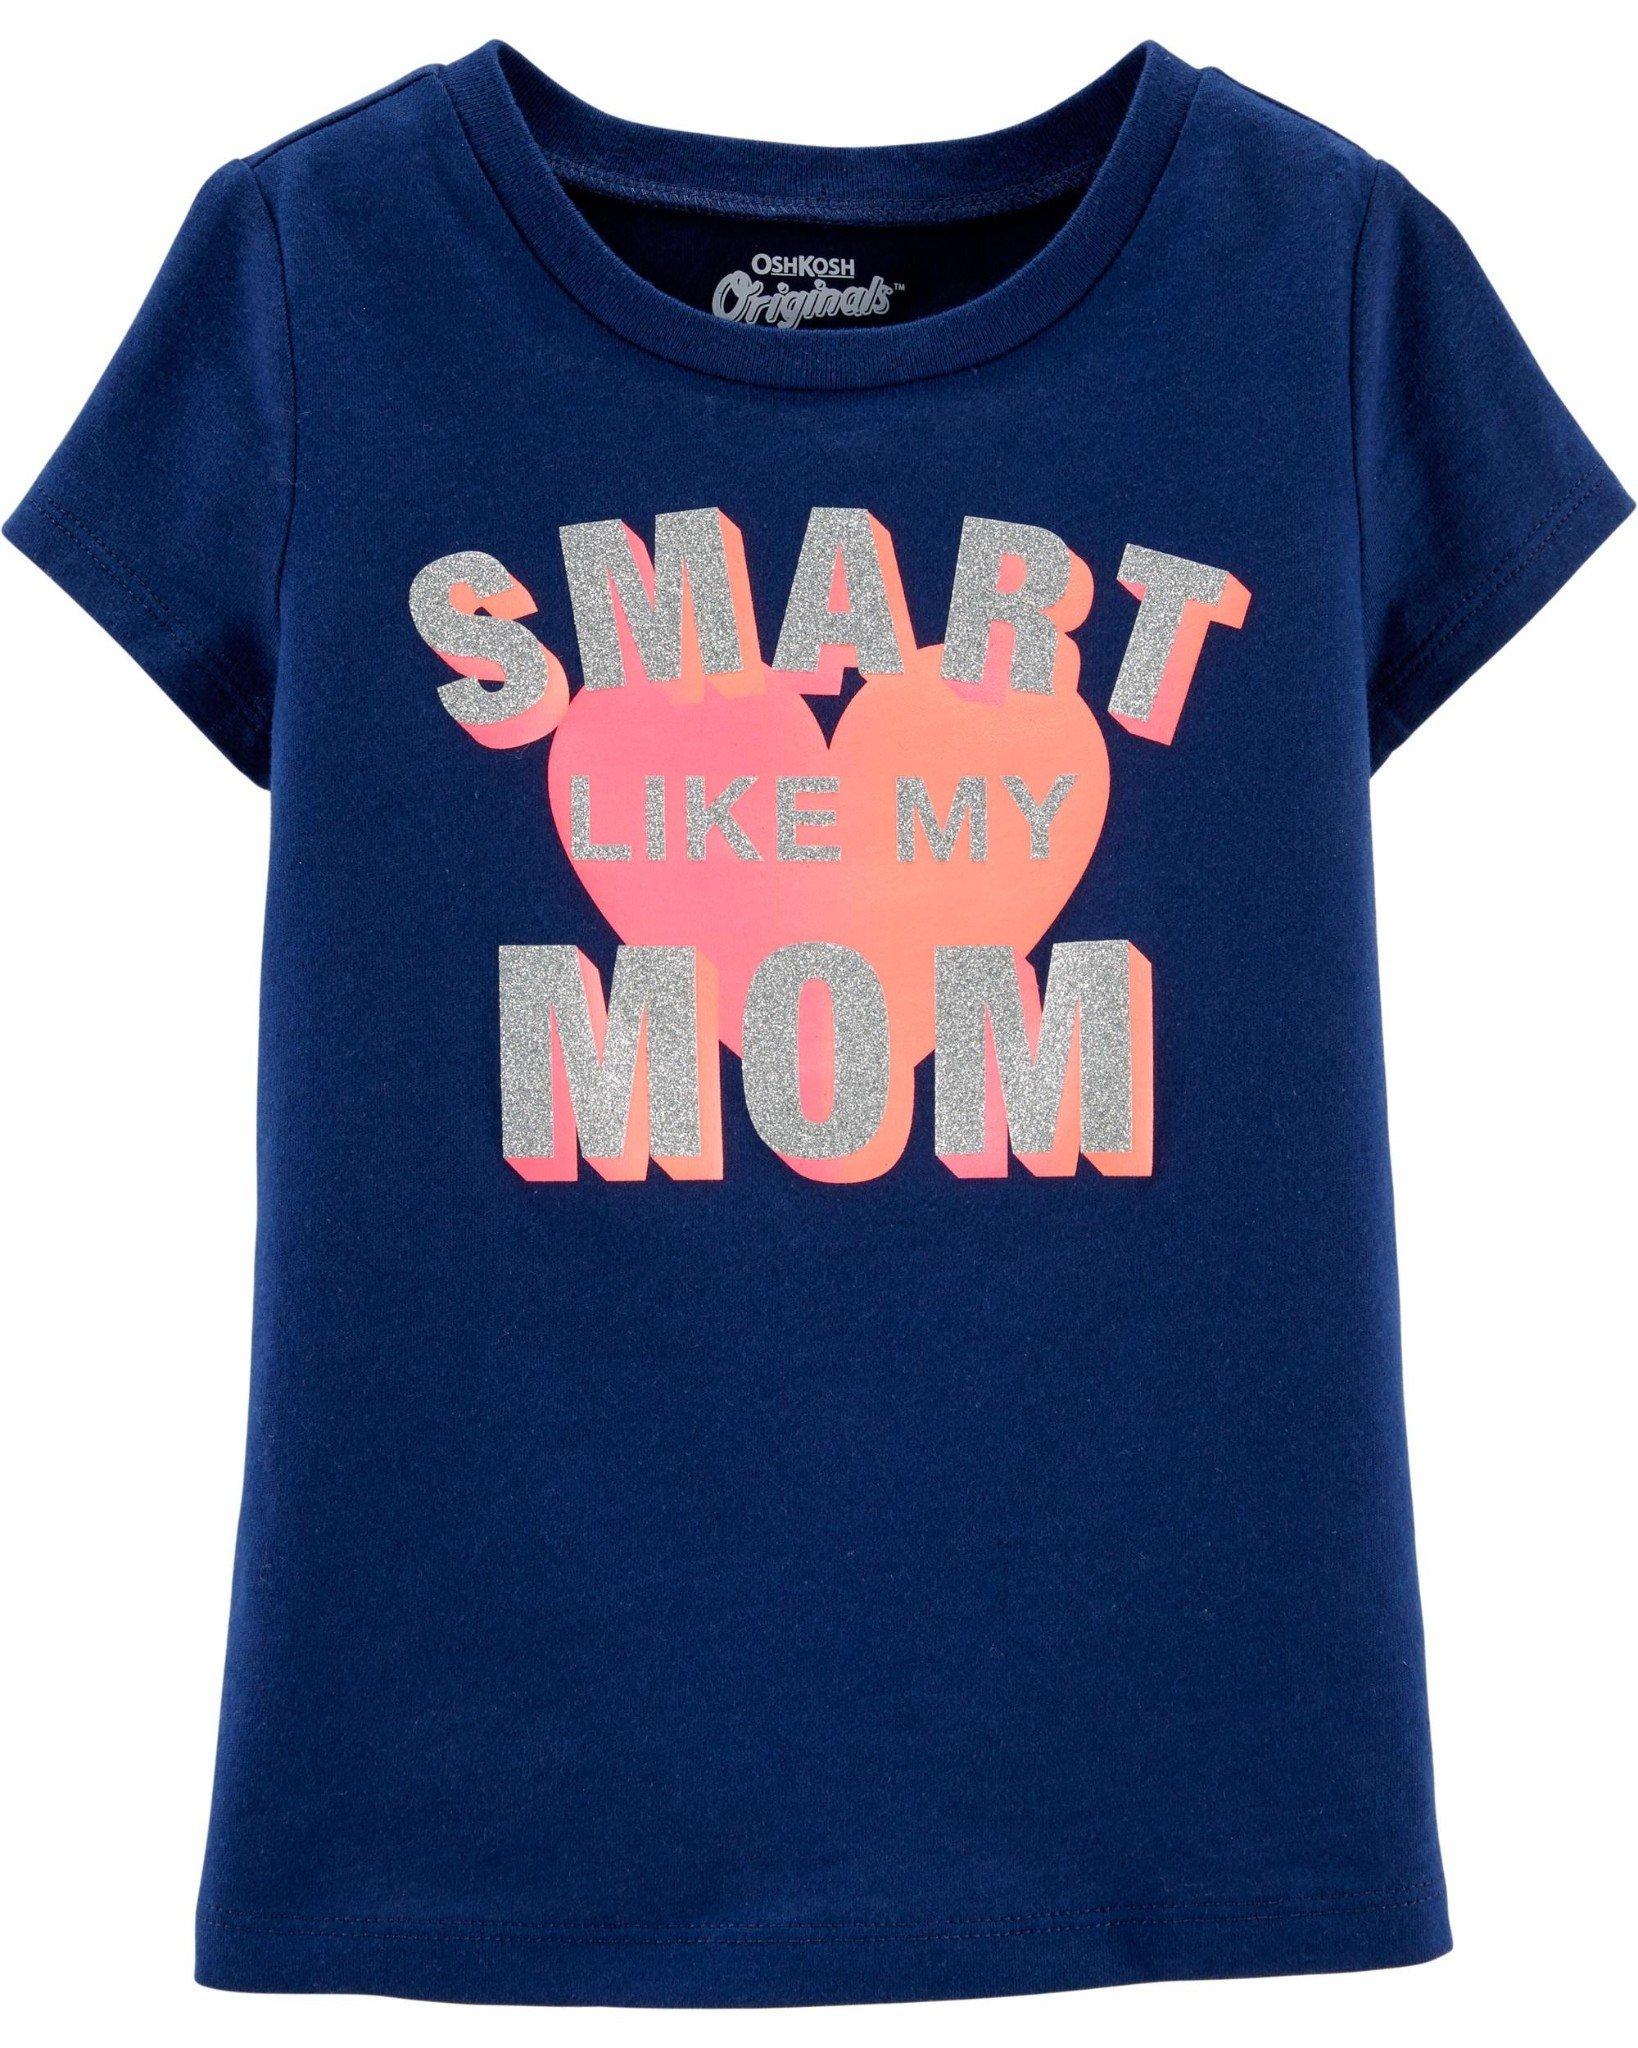 [4-15kg] Áo Thun OshKosh [Girl] - Xanh Navy/Smart Mom